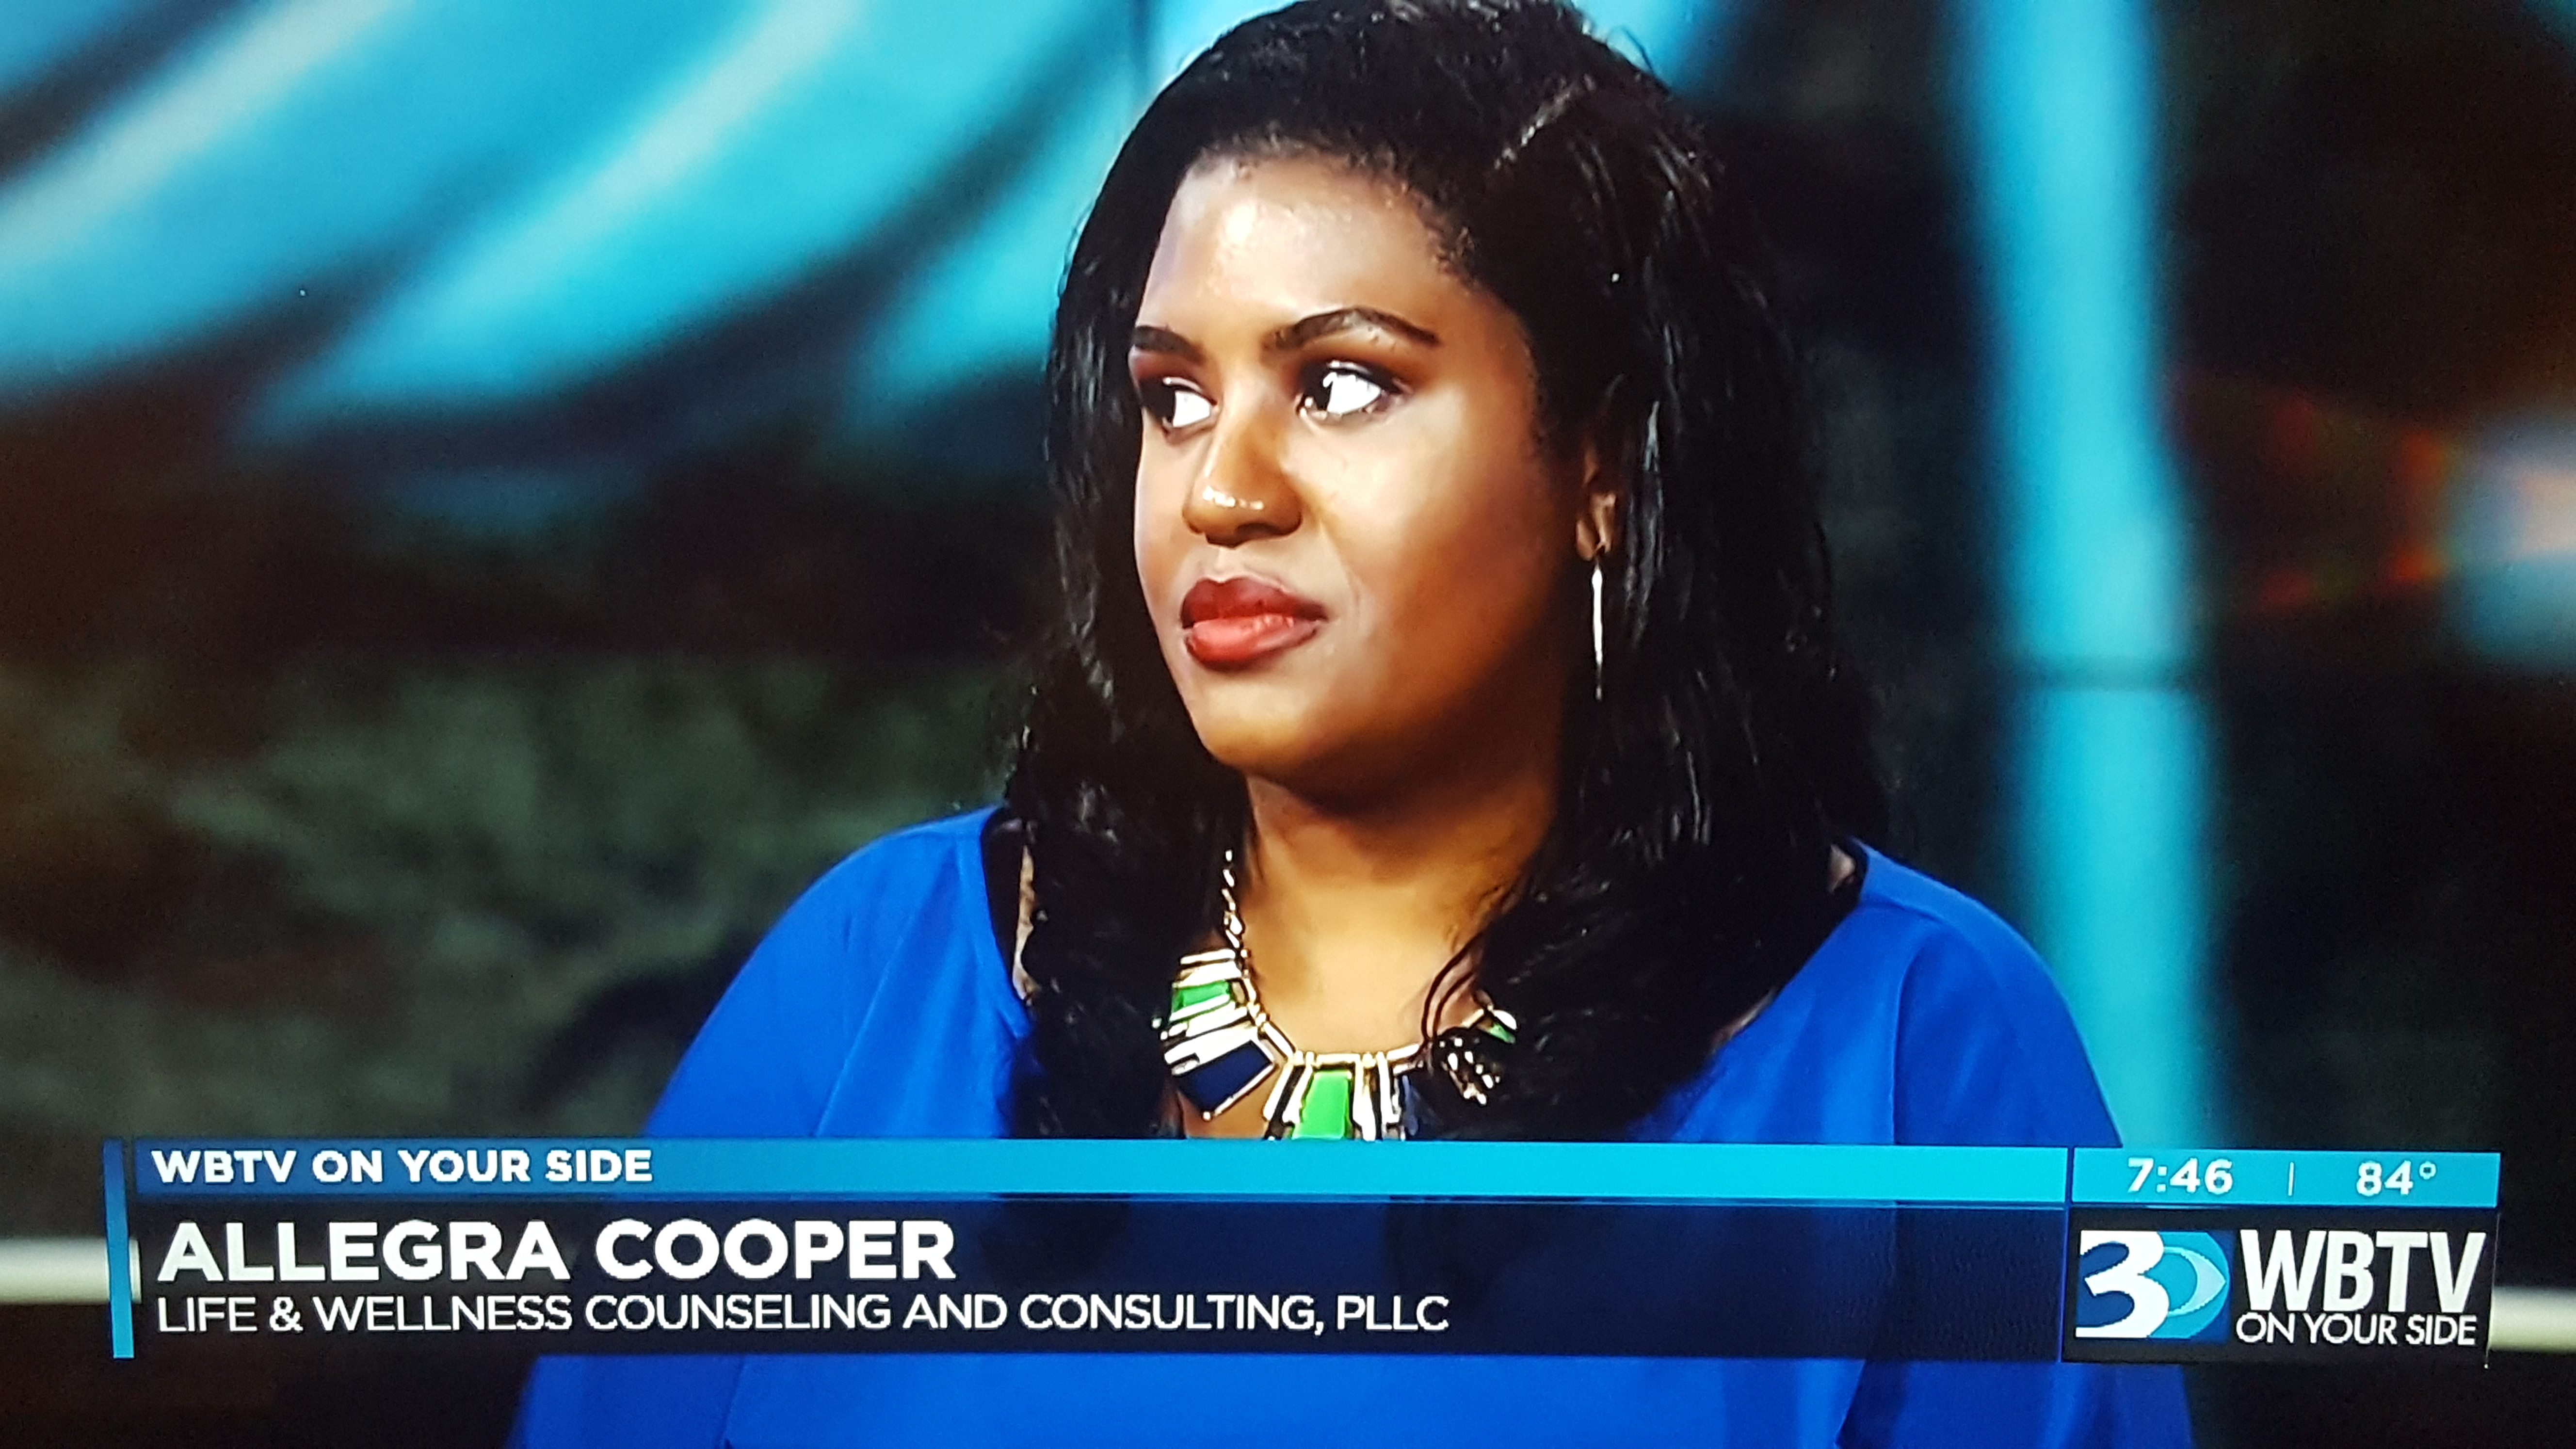 Allegra Cooper